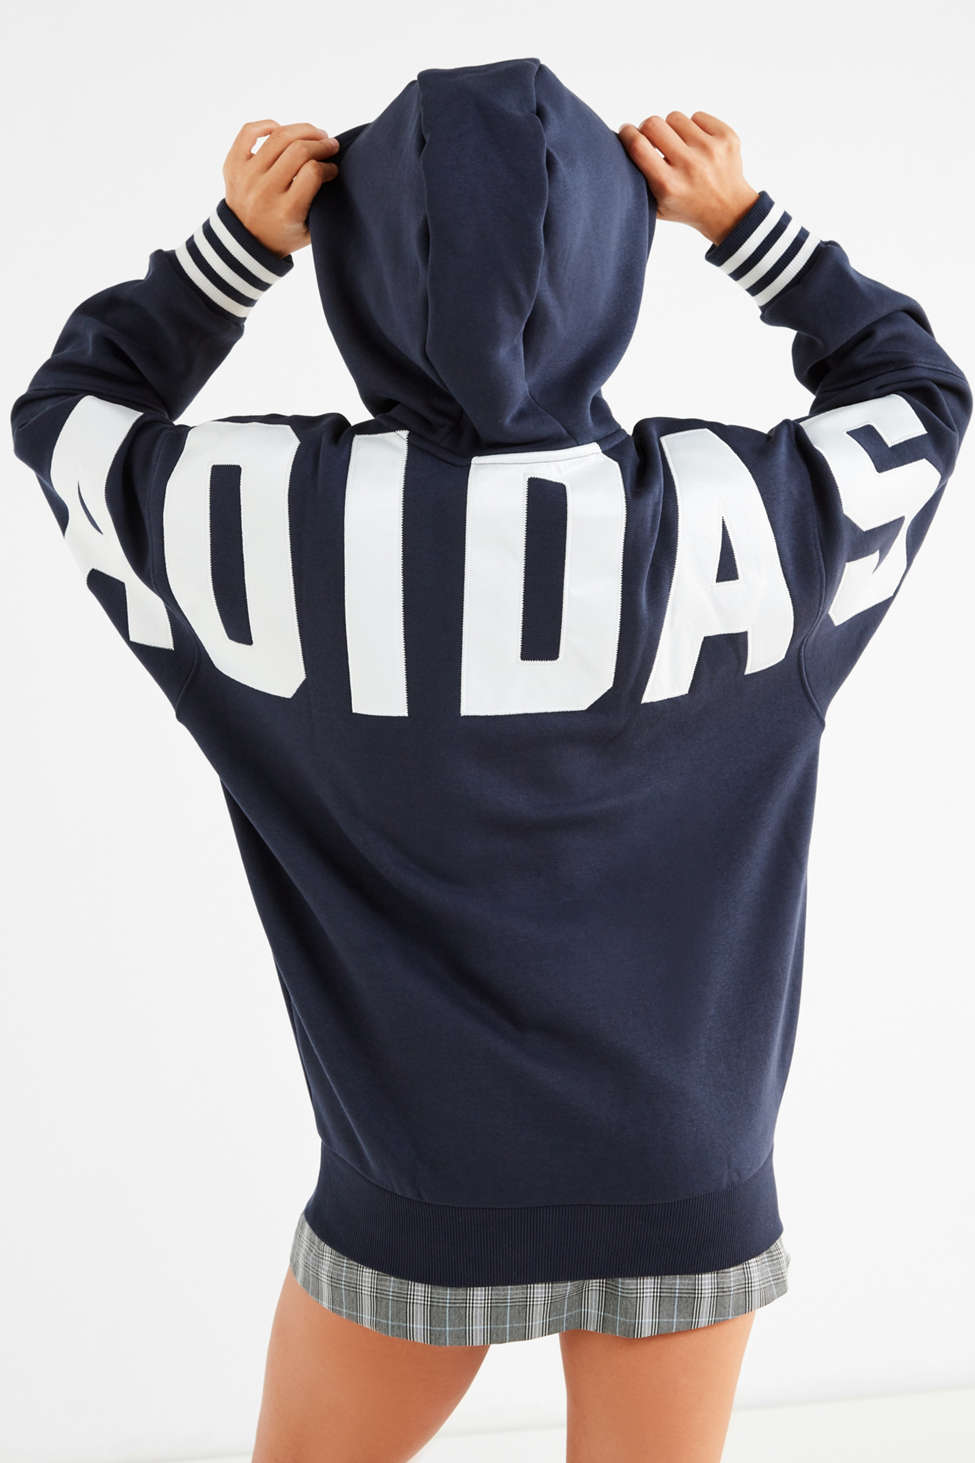 adidas originali originali originali fuzzy felpa felpa urban outfitters fbb639